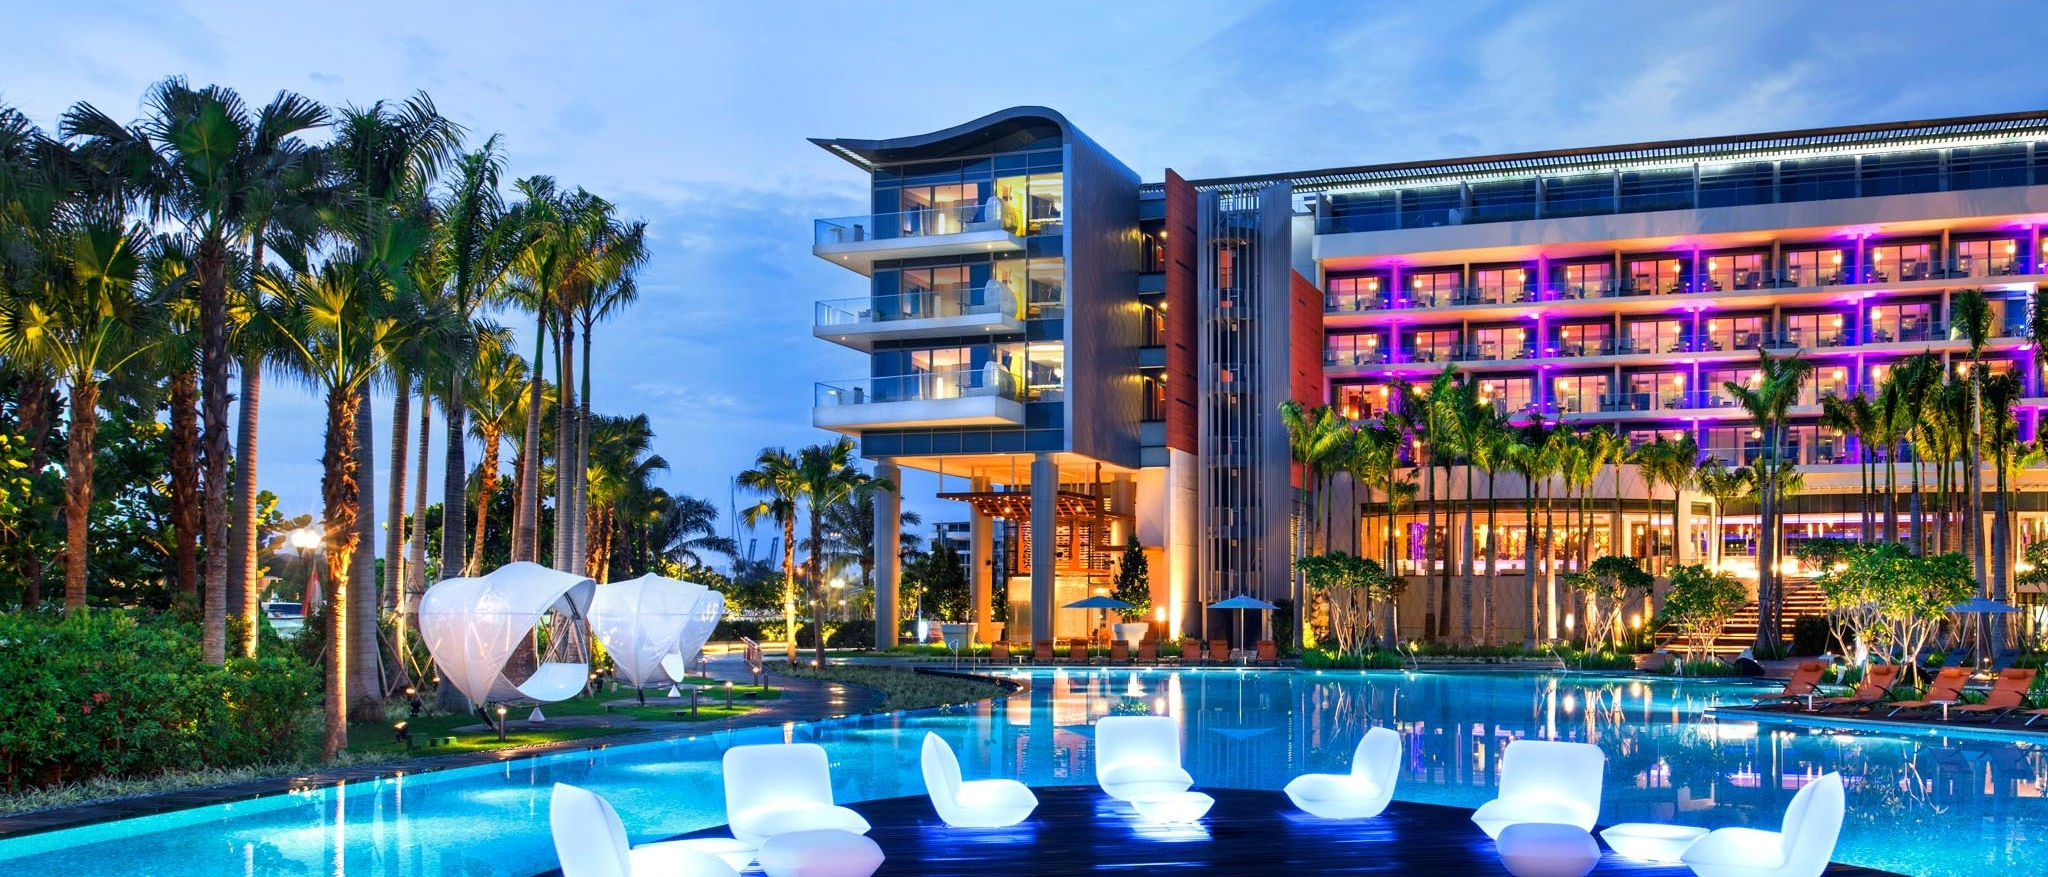 W Singapore. Sentosa Cove